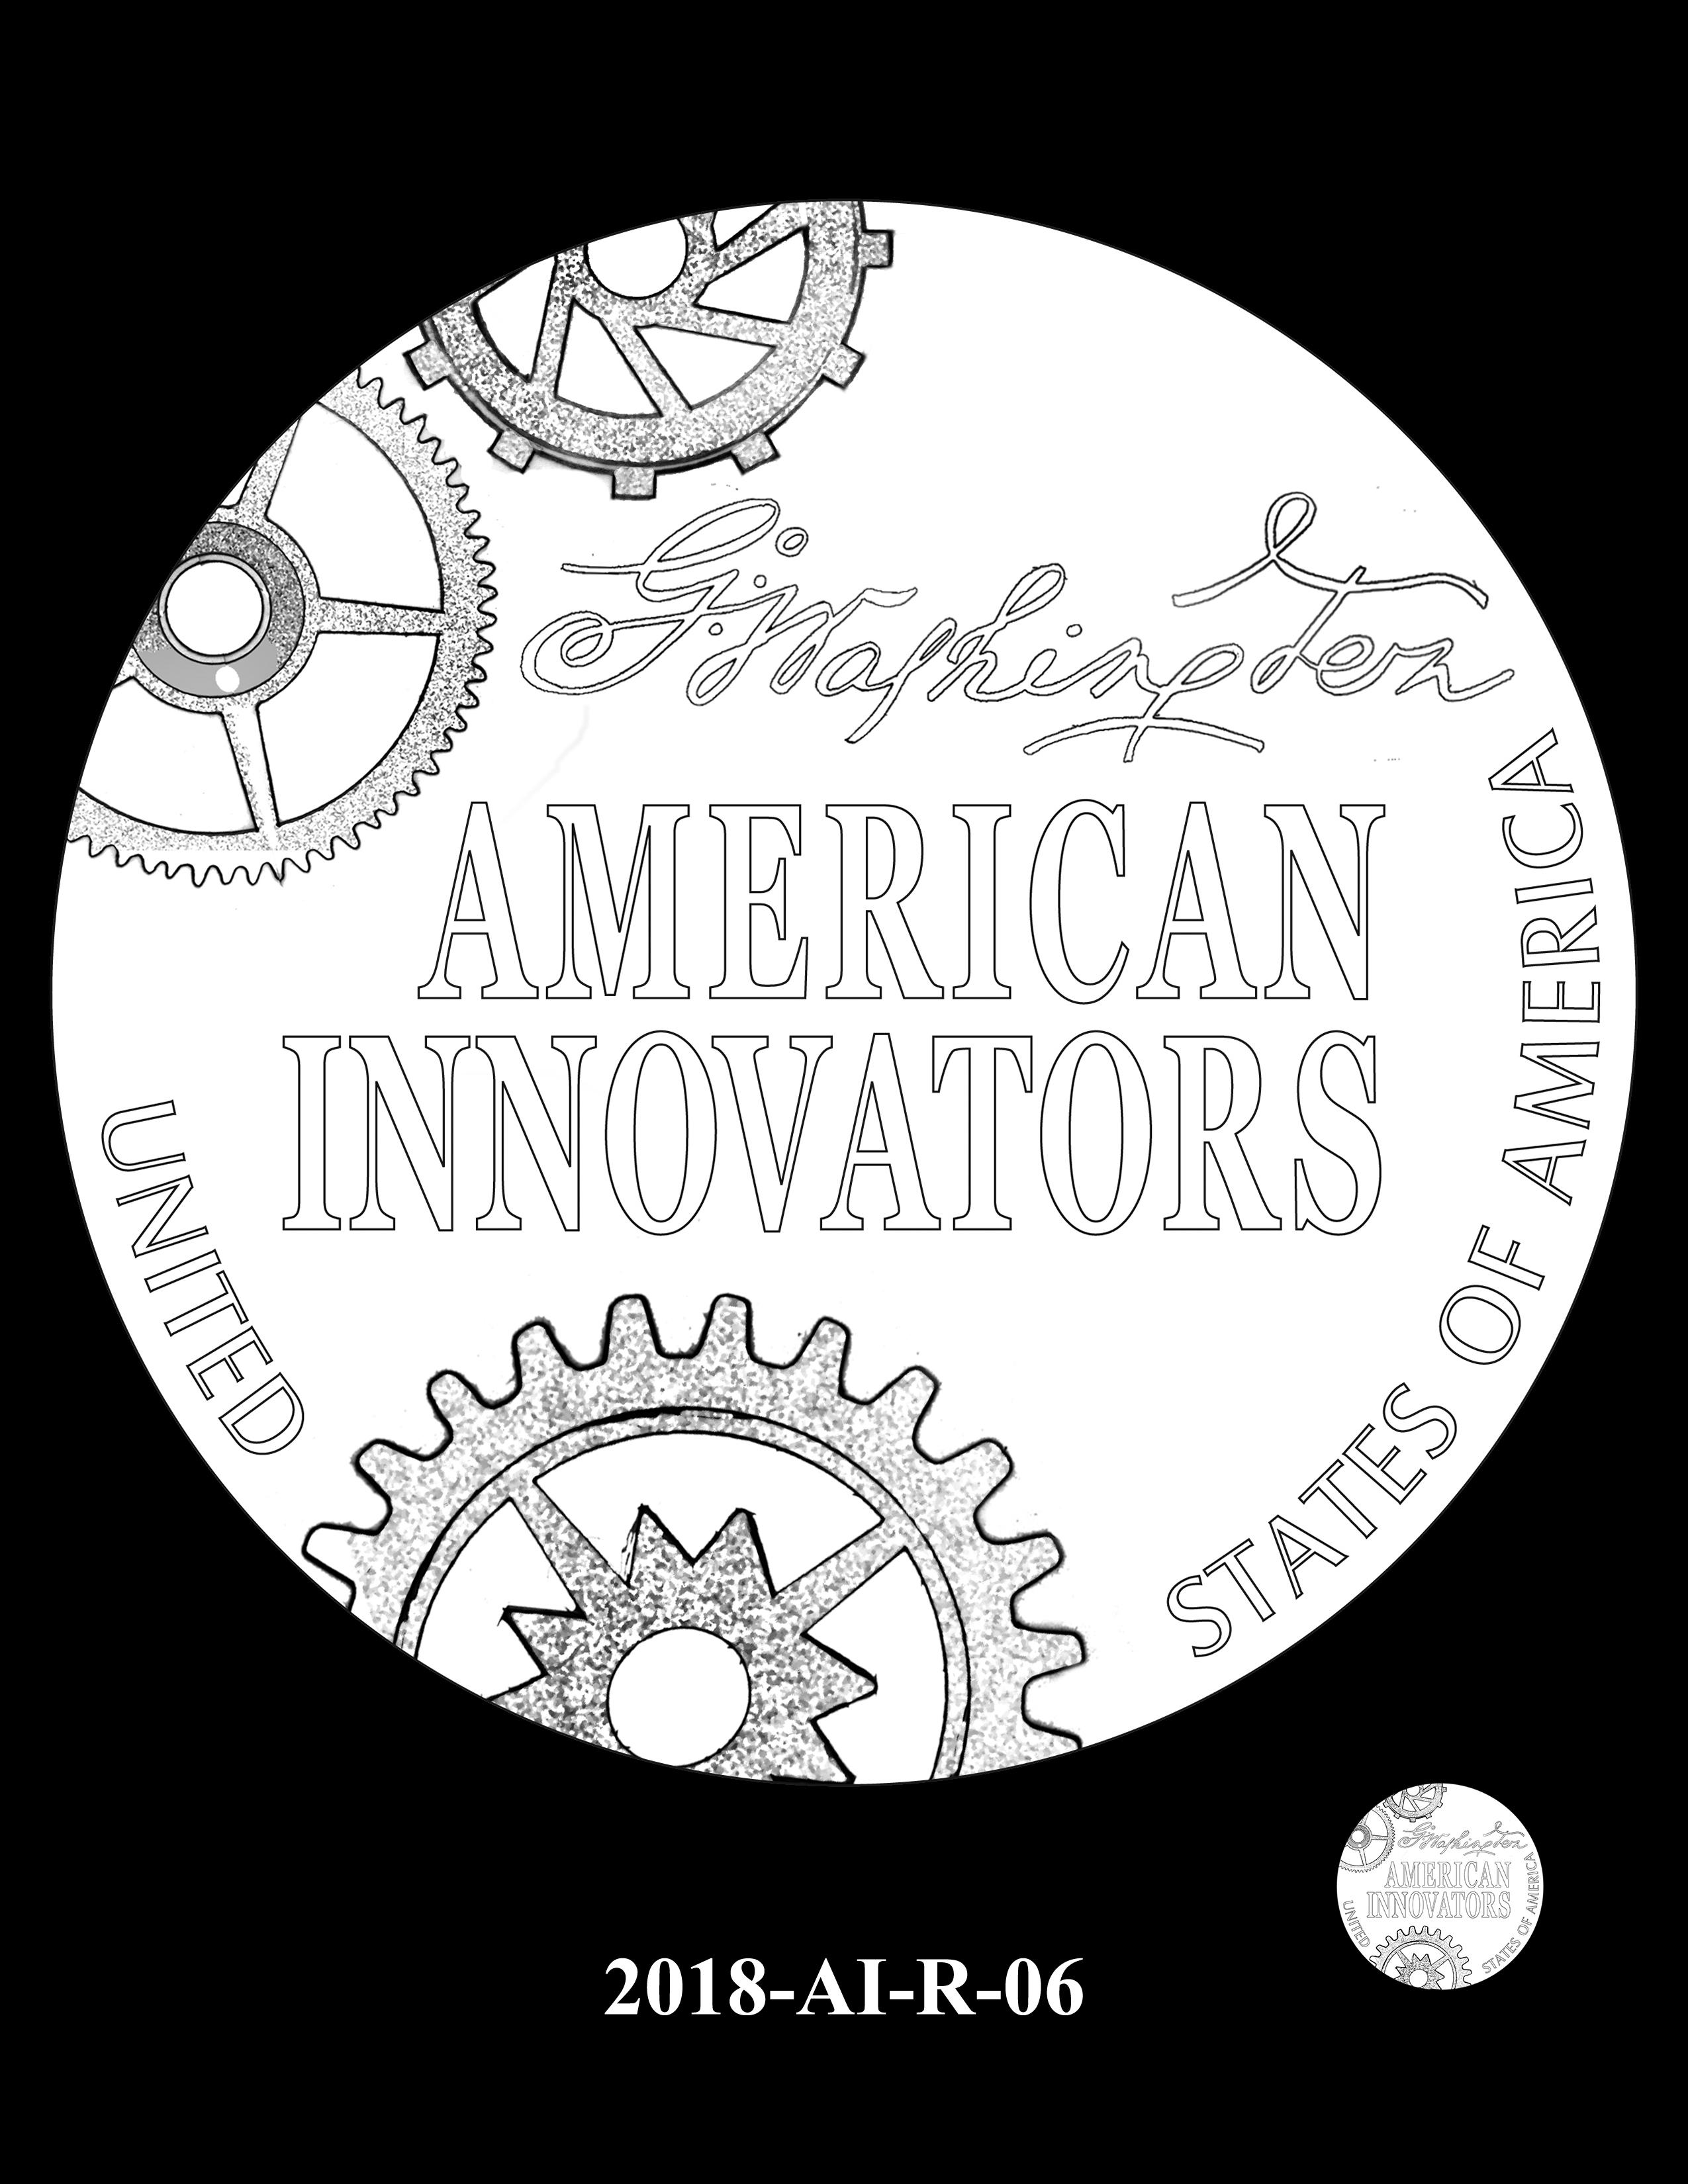 2018-AI-R-06 -- 2018 American Innovation $1 Coin